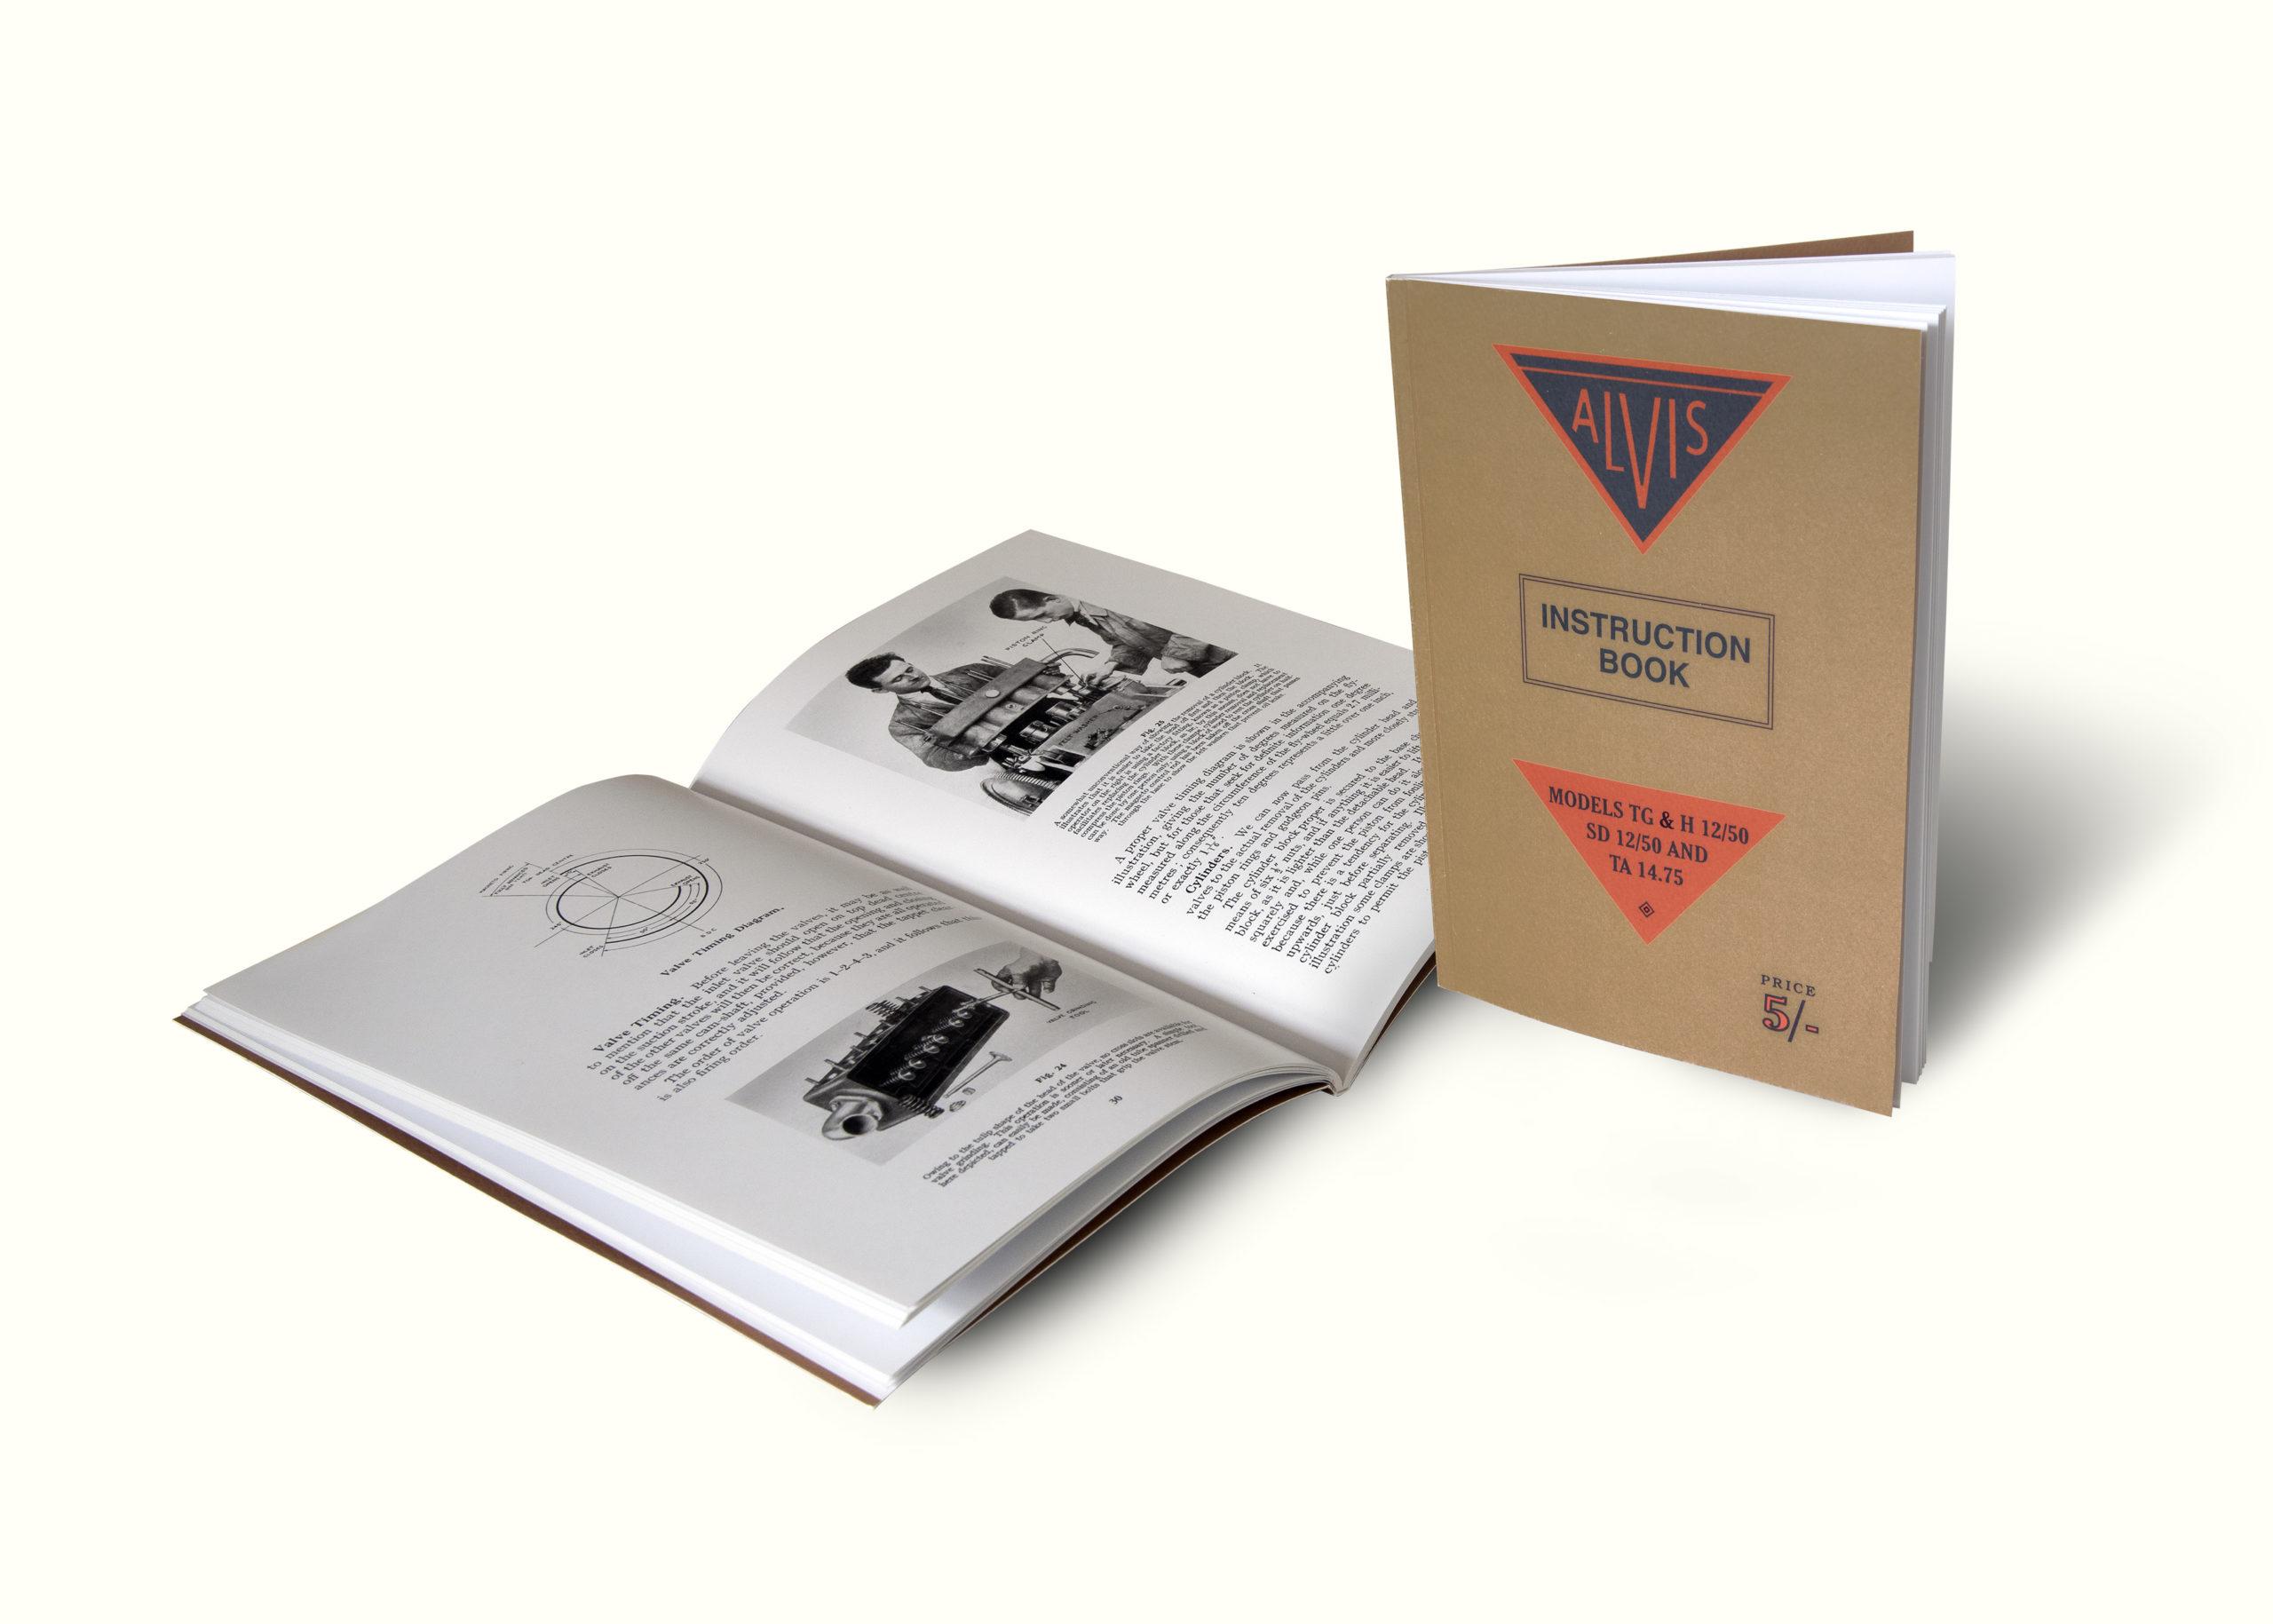 https://www.redtriangle.co.uk/wp-content/uploads/2020/11/1-1250-14.75-Instruction-Book-scaled.jpg